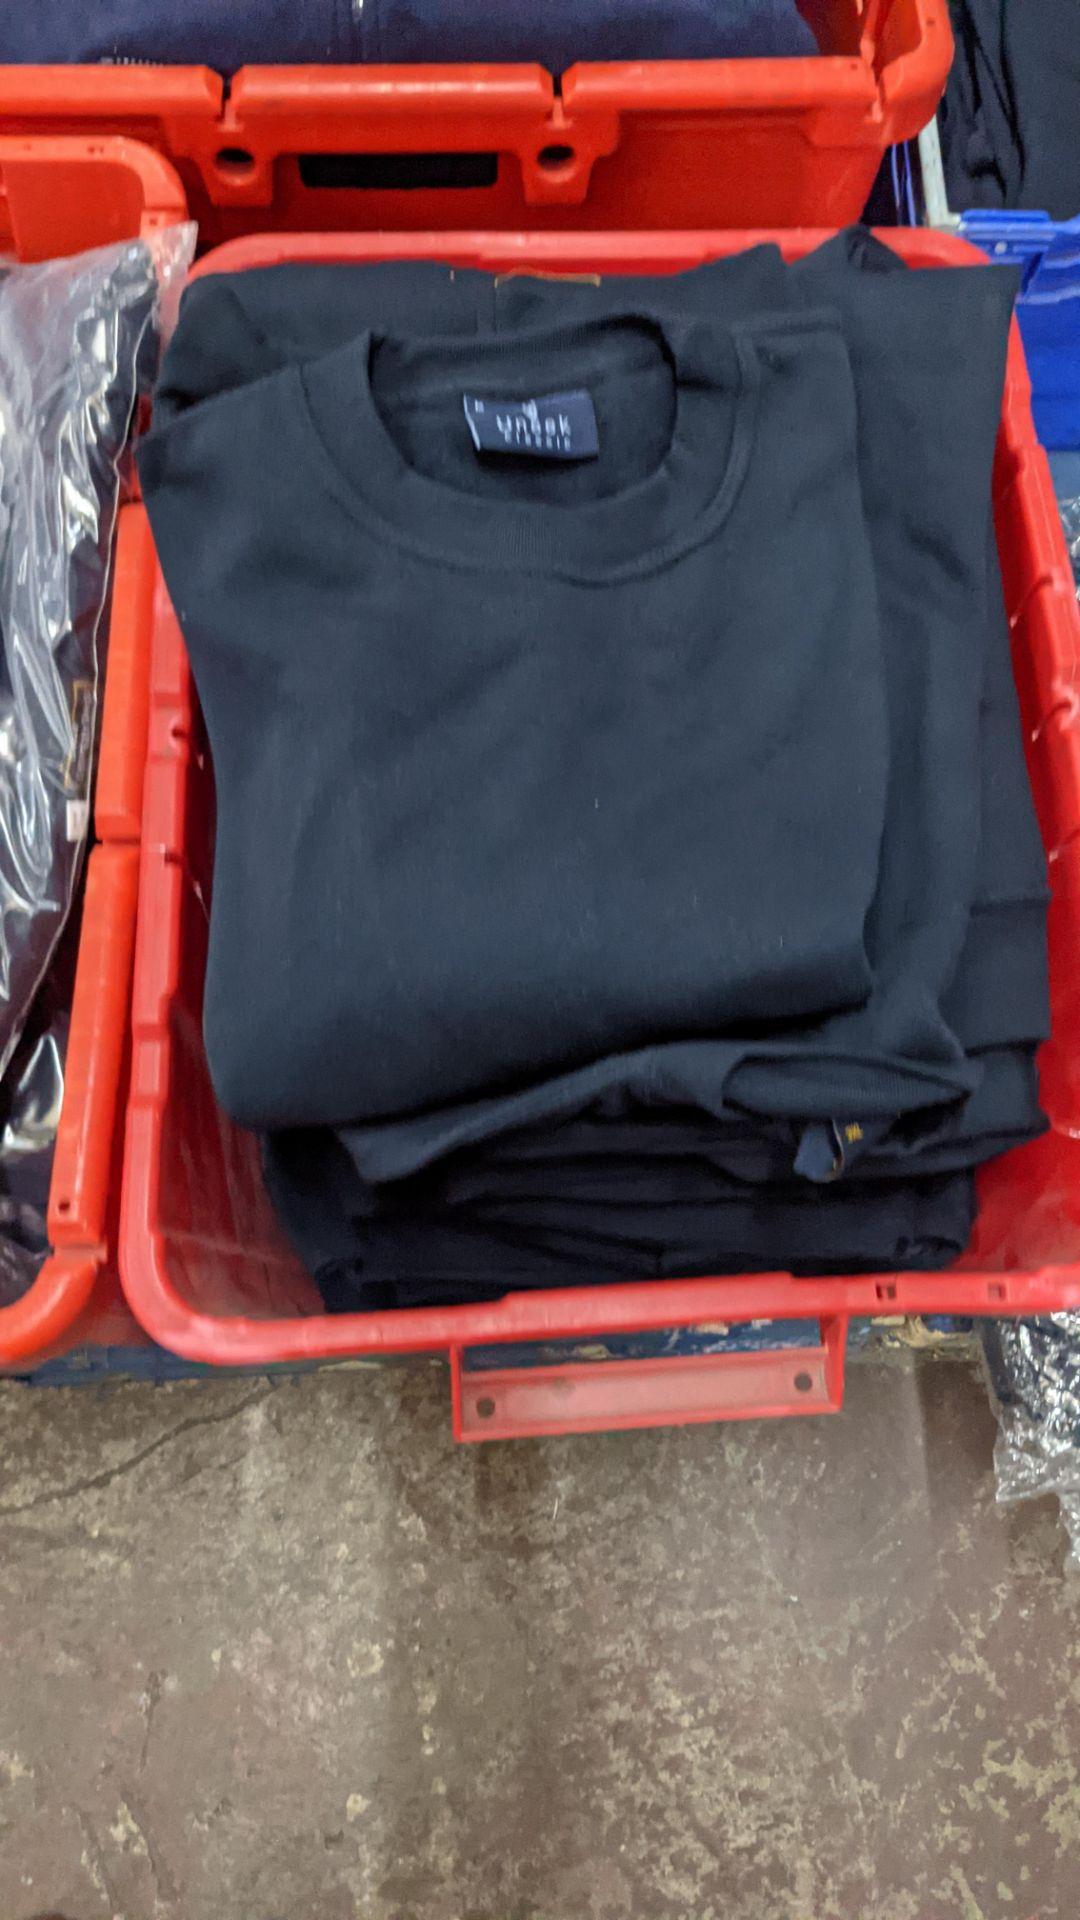 Approx 12 off navy sweatshirts - Image 3 of 5